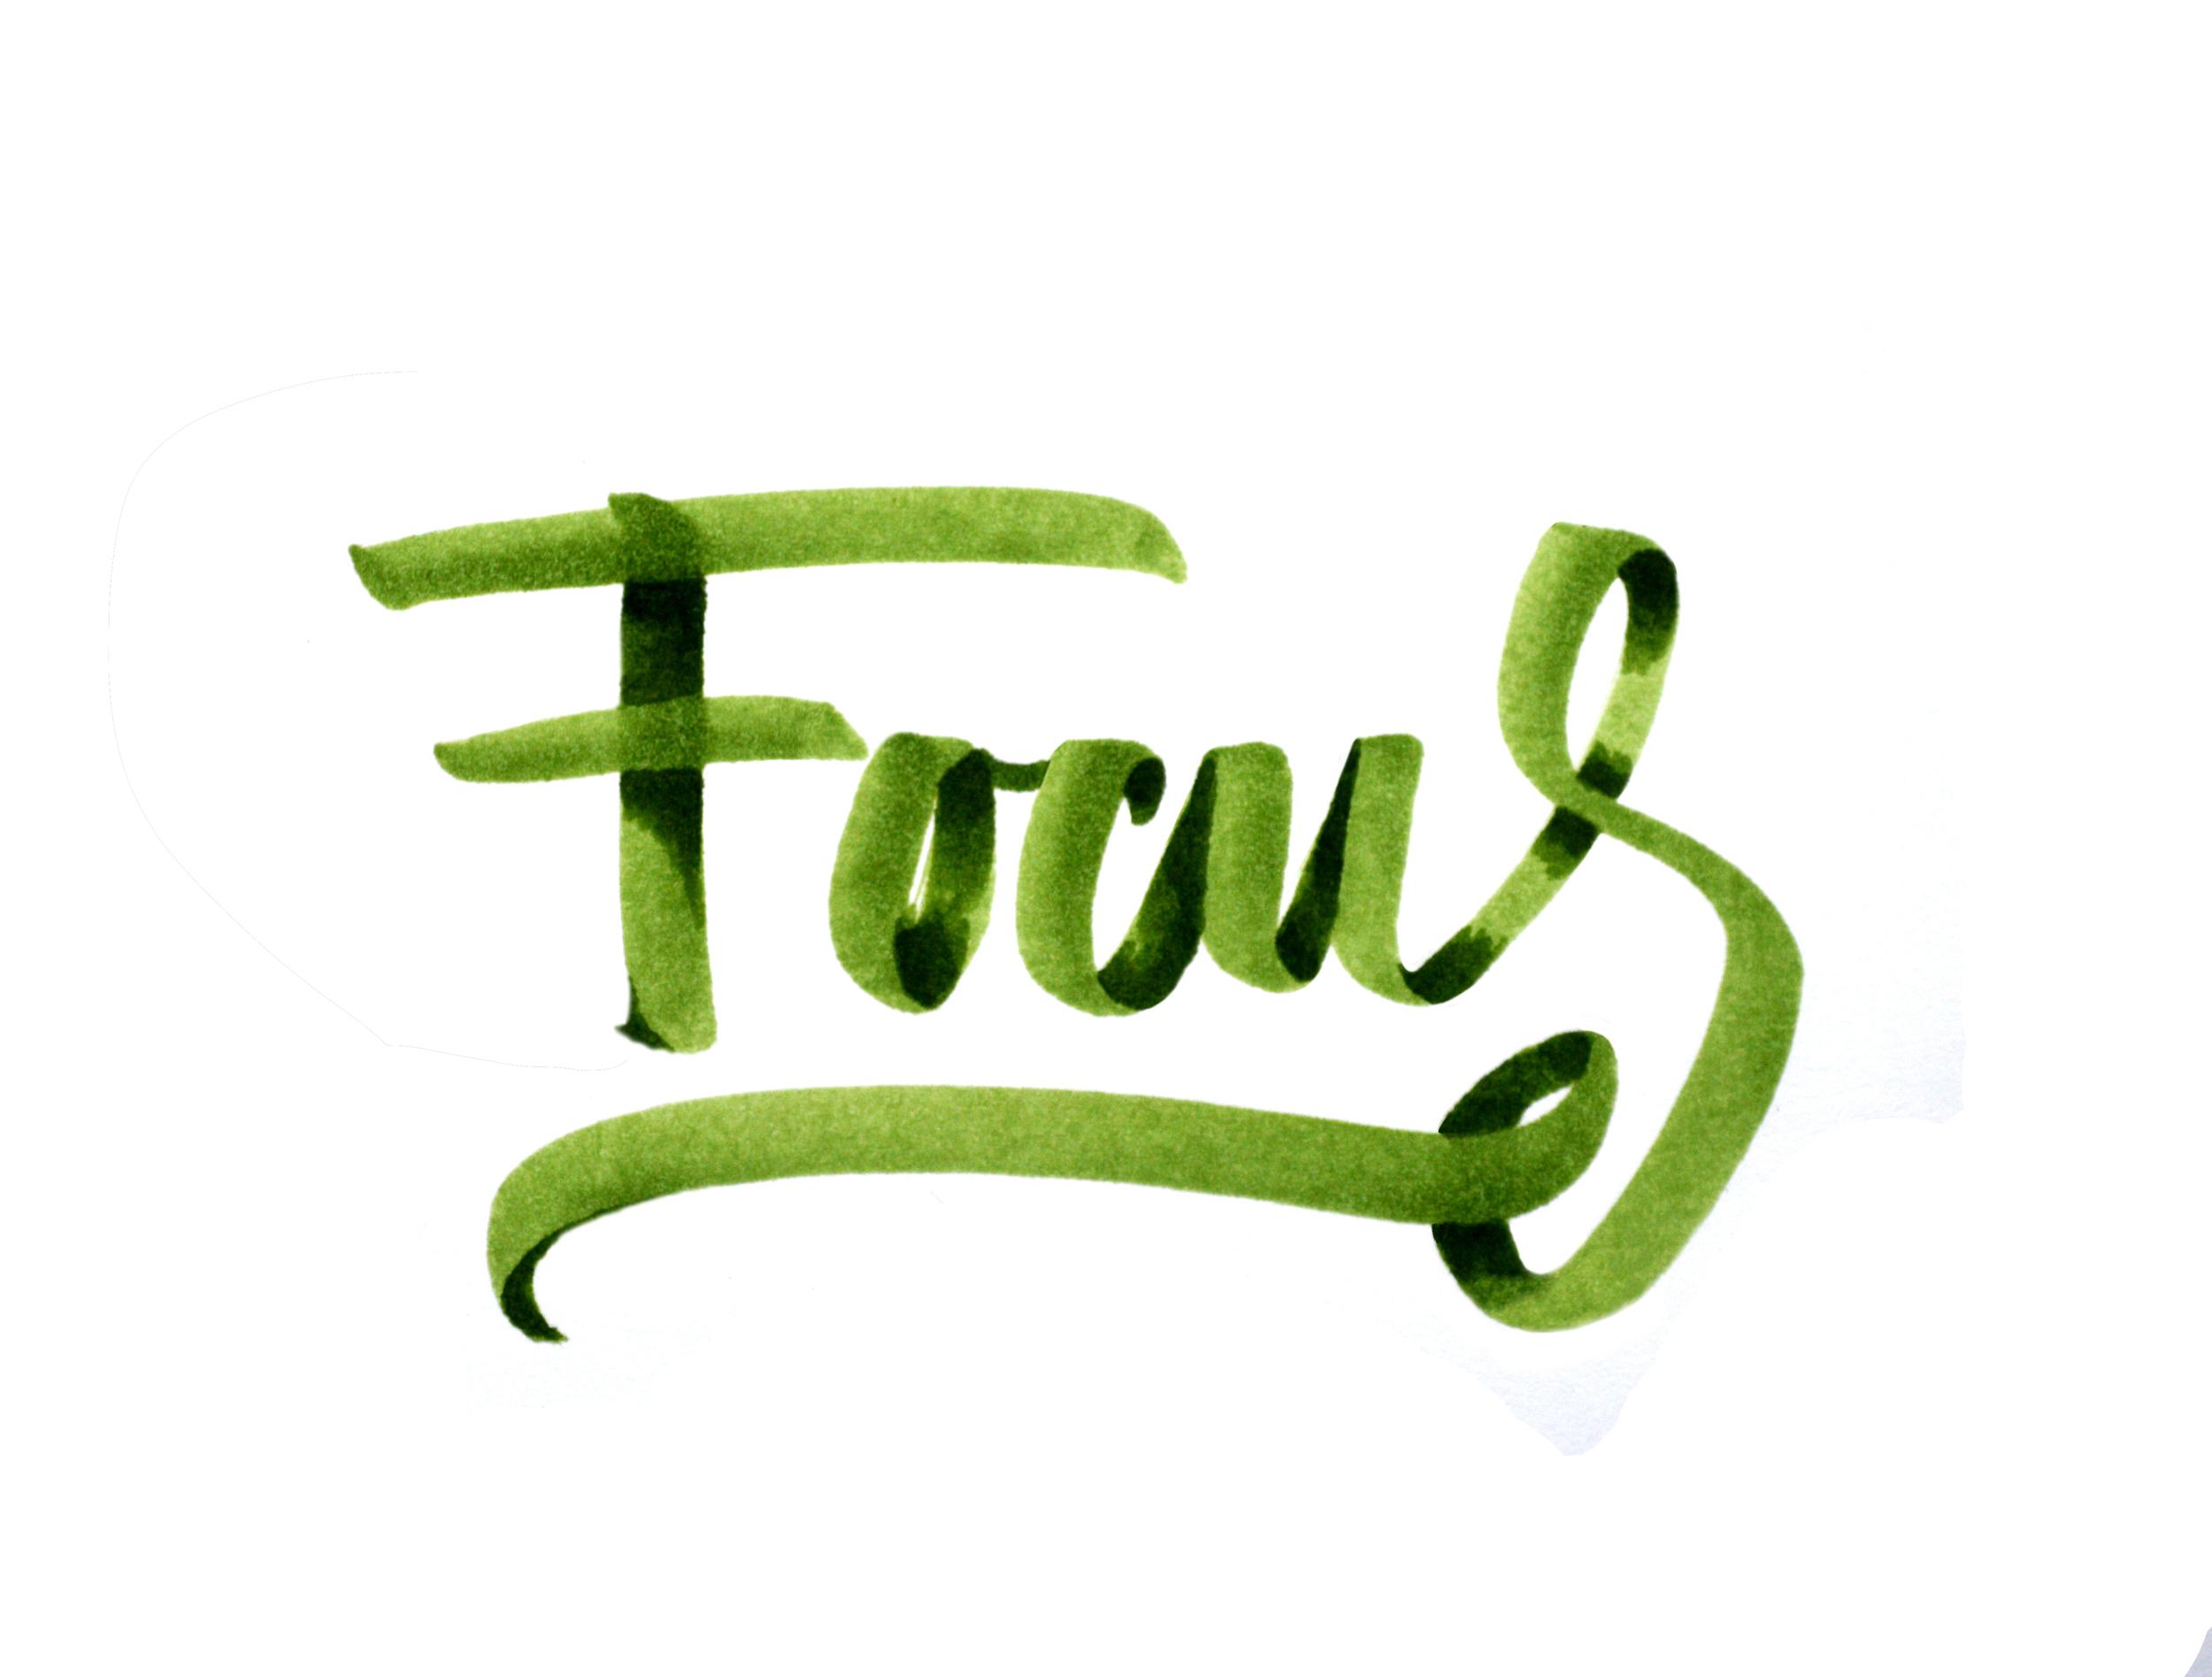 017_Focus.jpg